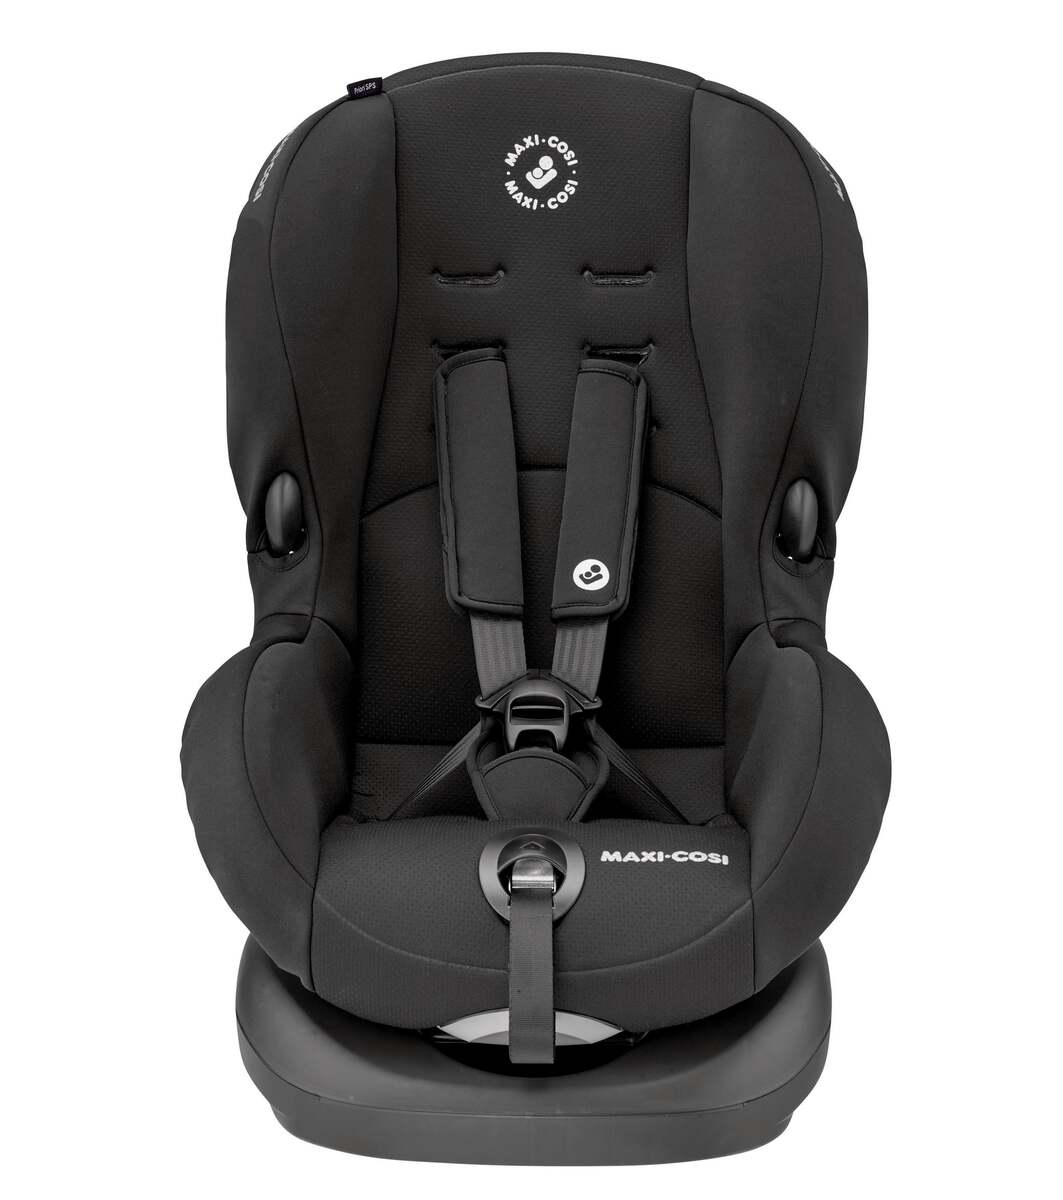 "Bild 1 von Maxi-Cosi Auto-Kindersitz ""Priori SPS+"", Basic Black"